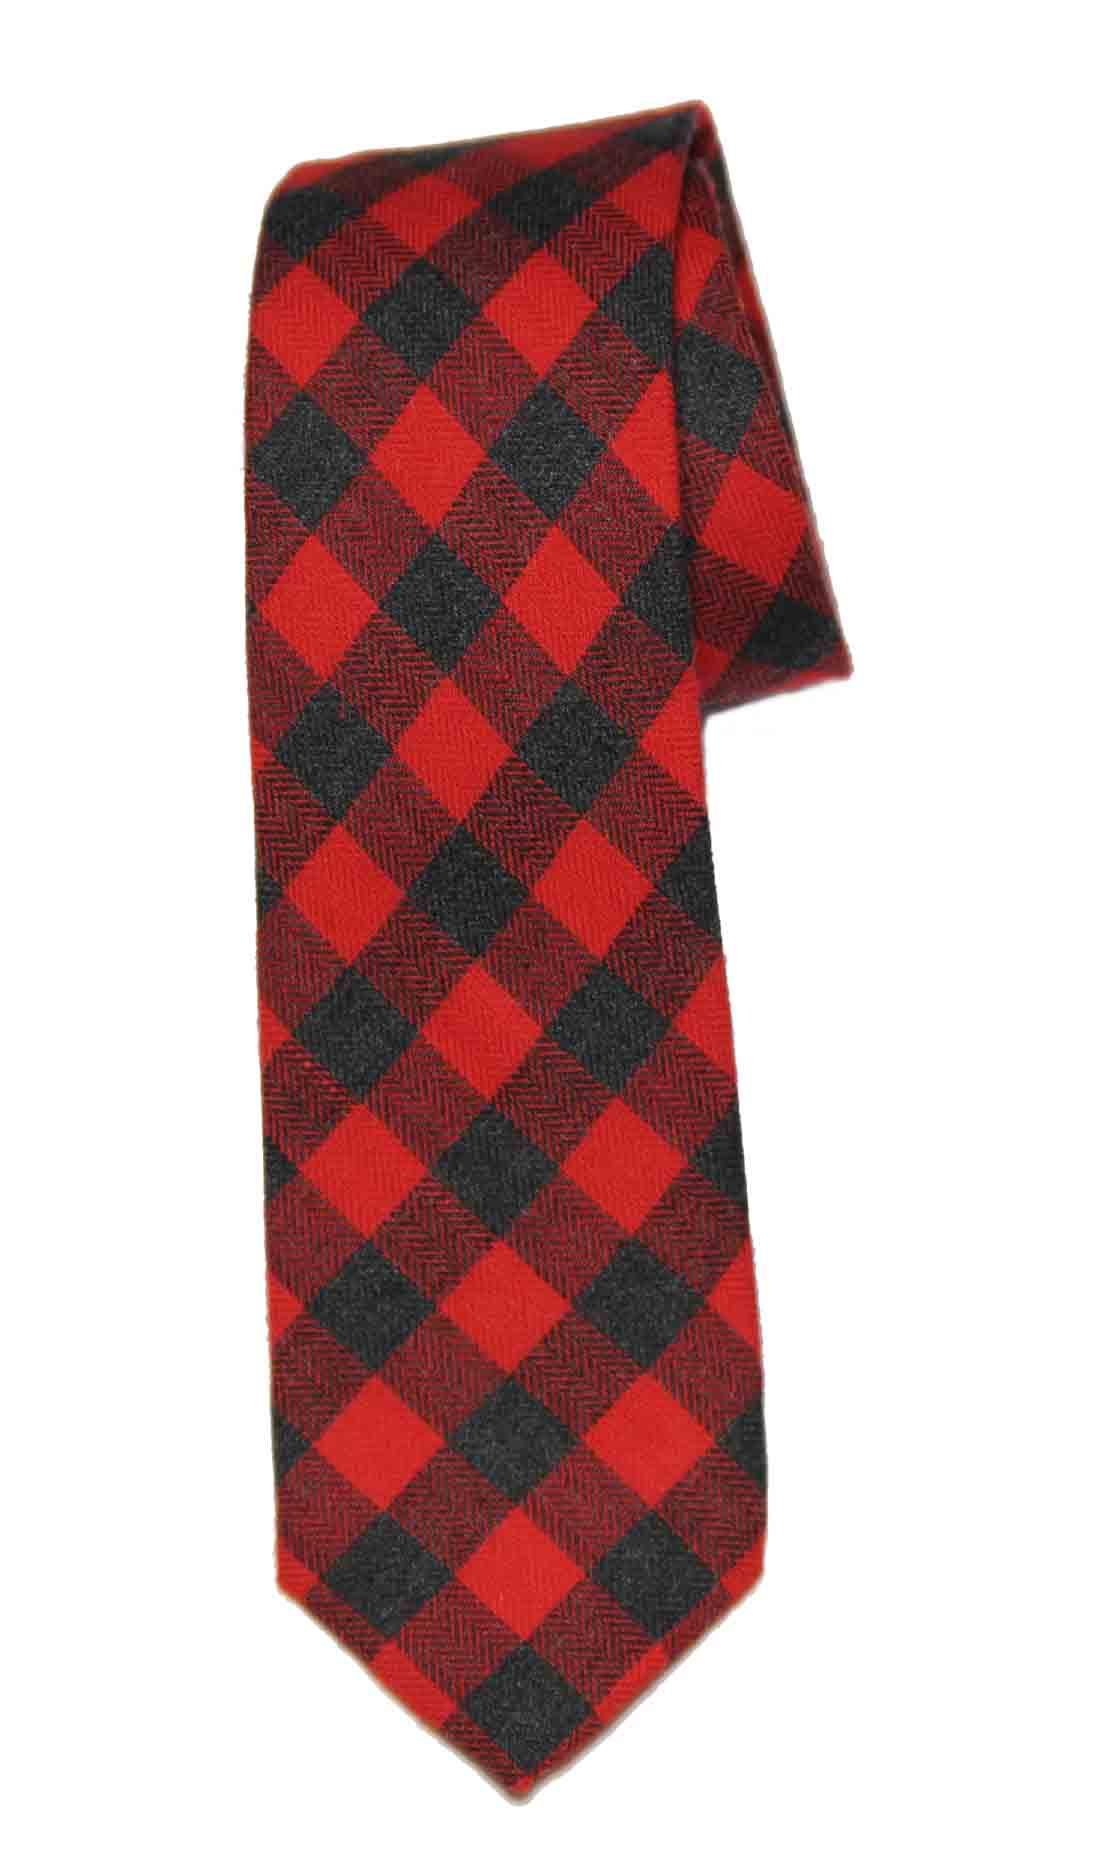 Gascoigne Tie Buffalo Check Pattern Red Black Cotton Men's